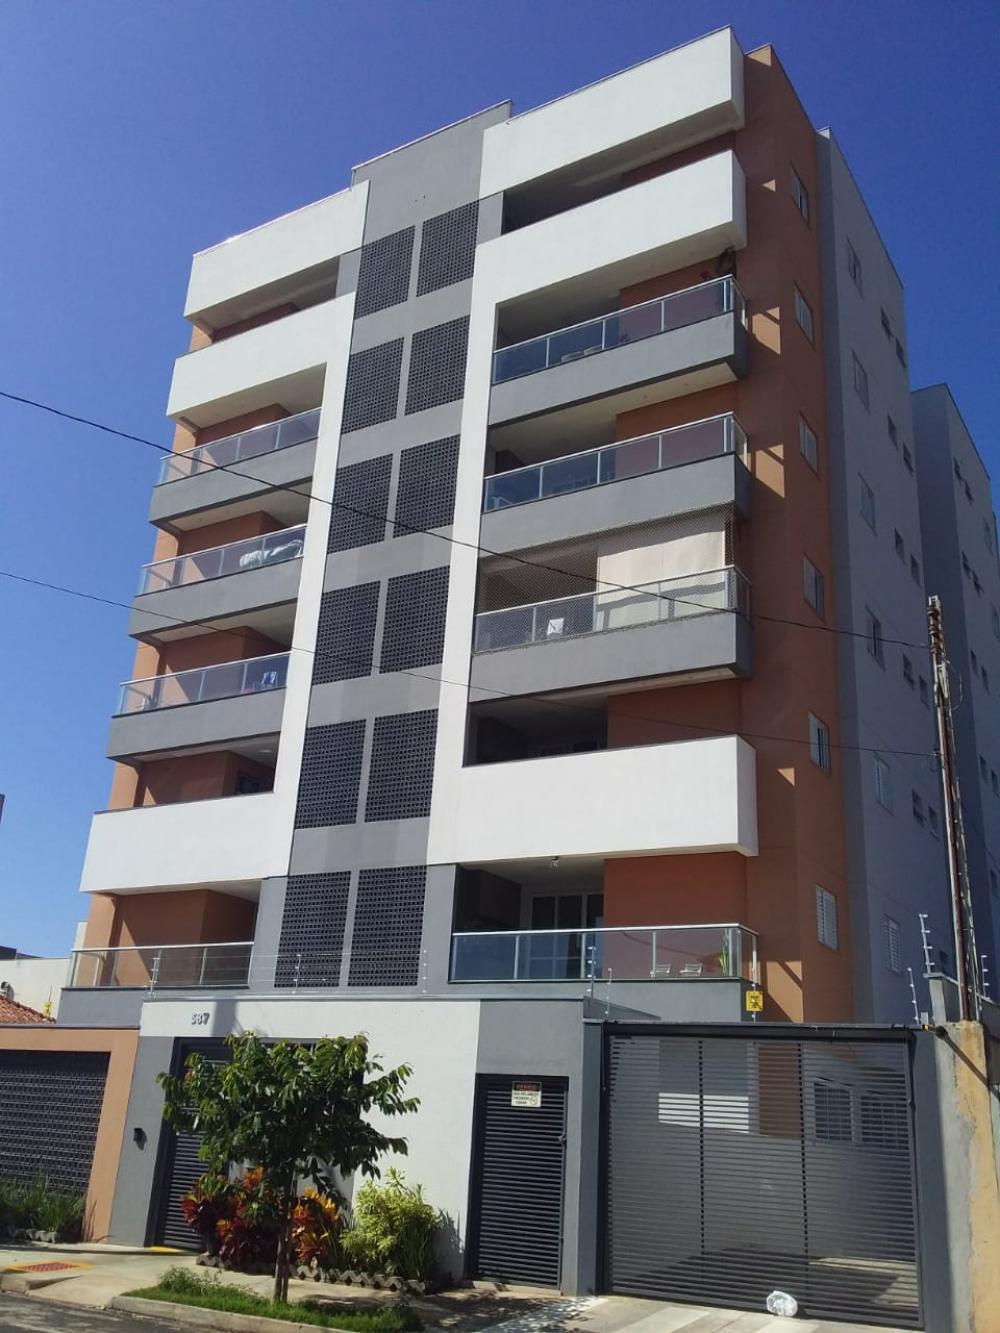 Sao Jose do Rio Preto Apartamento Venda R$510.000,00 Condominio R$350,00 3 Dormitorios 2 Vagas Area construida 120.00m2